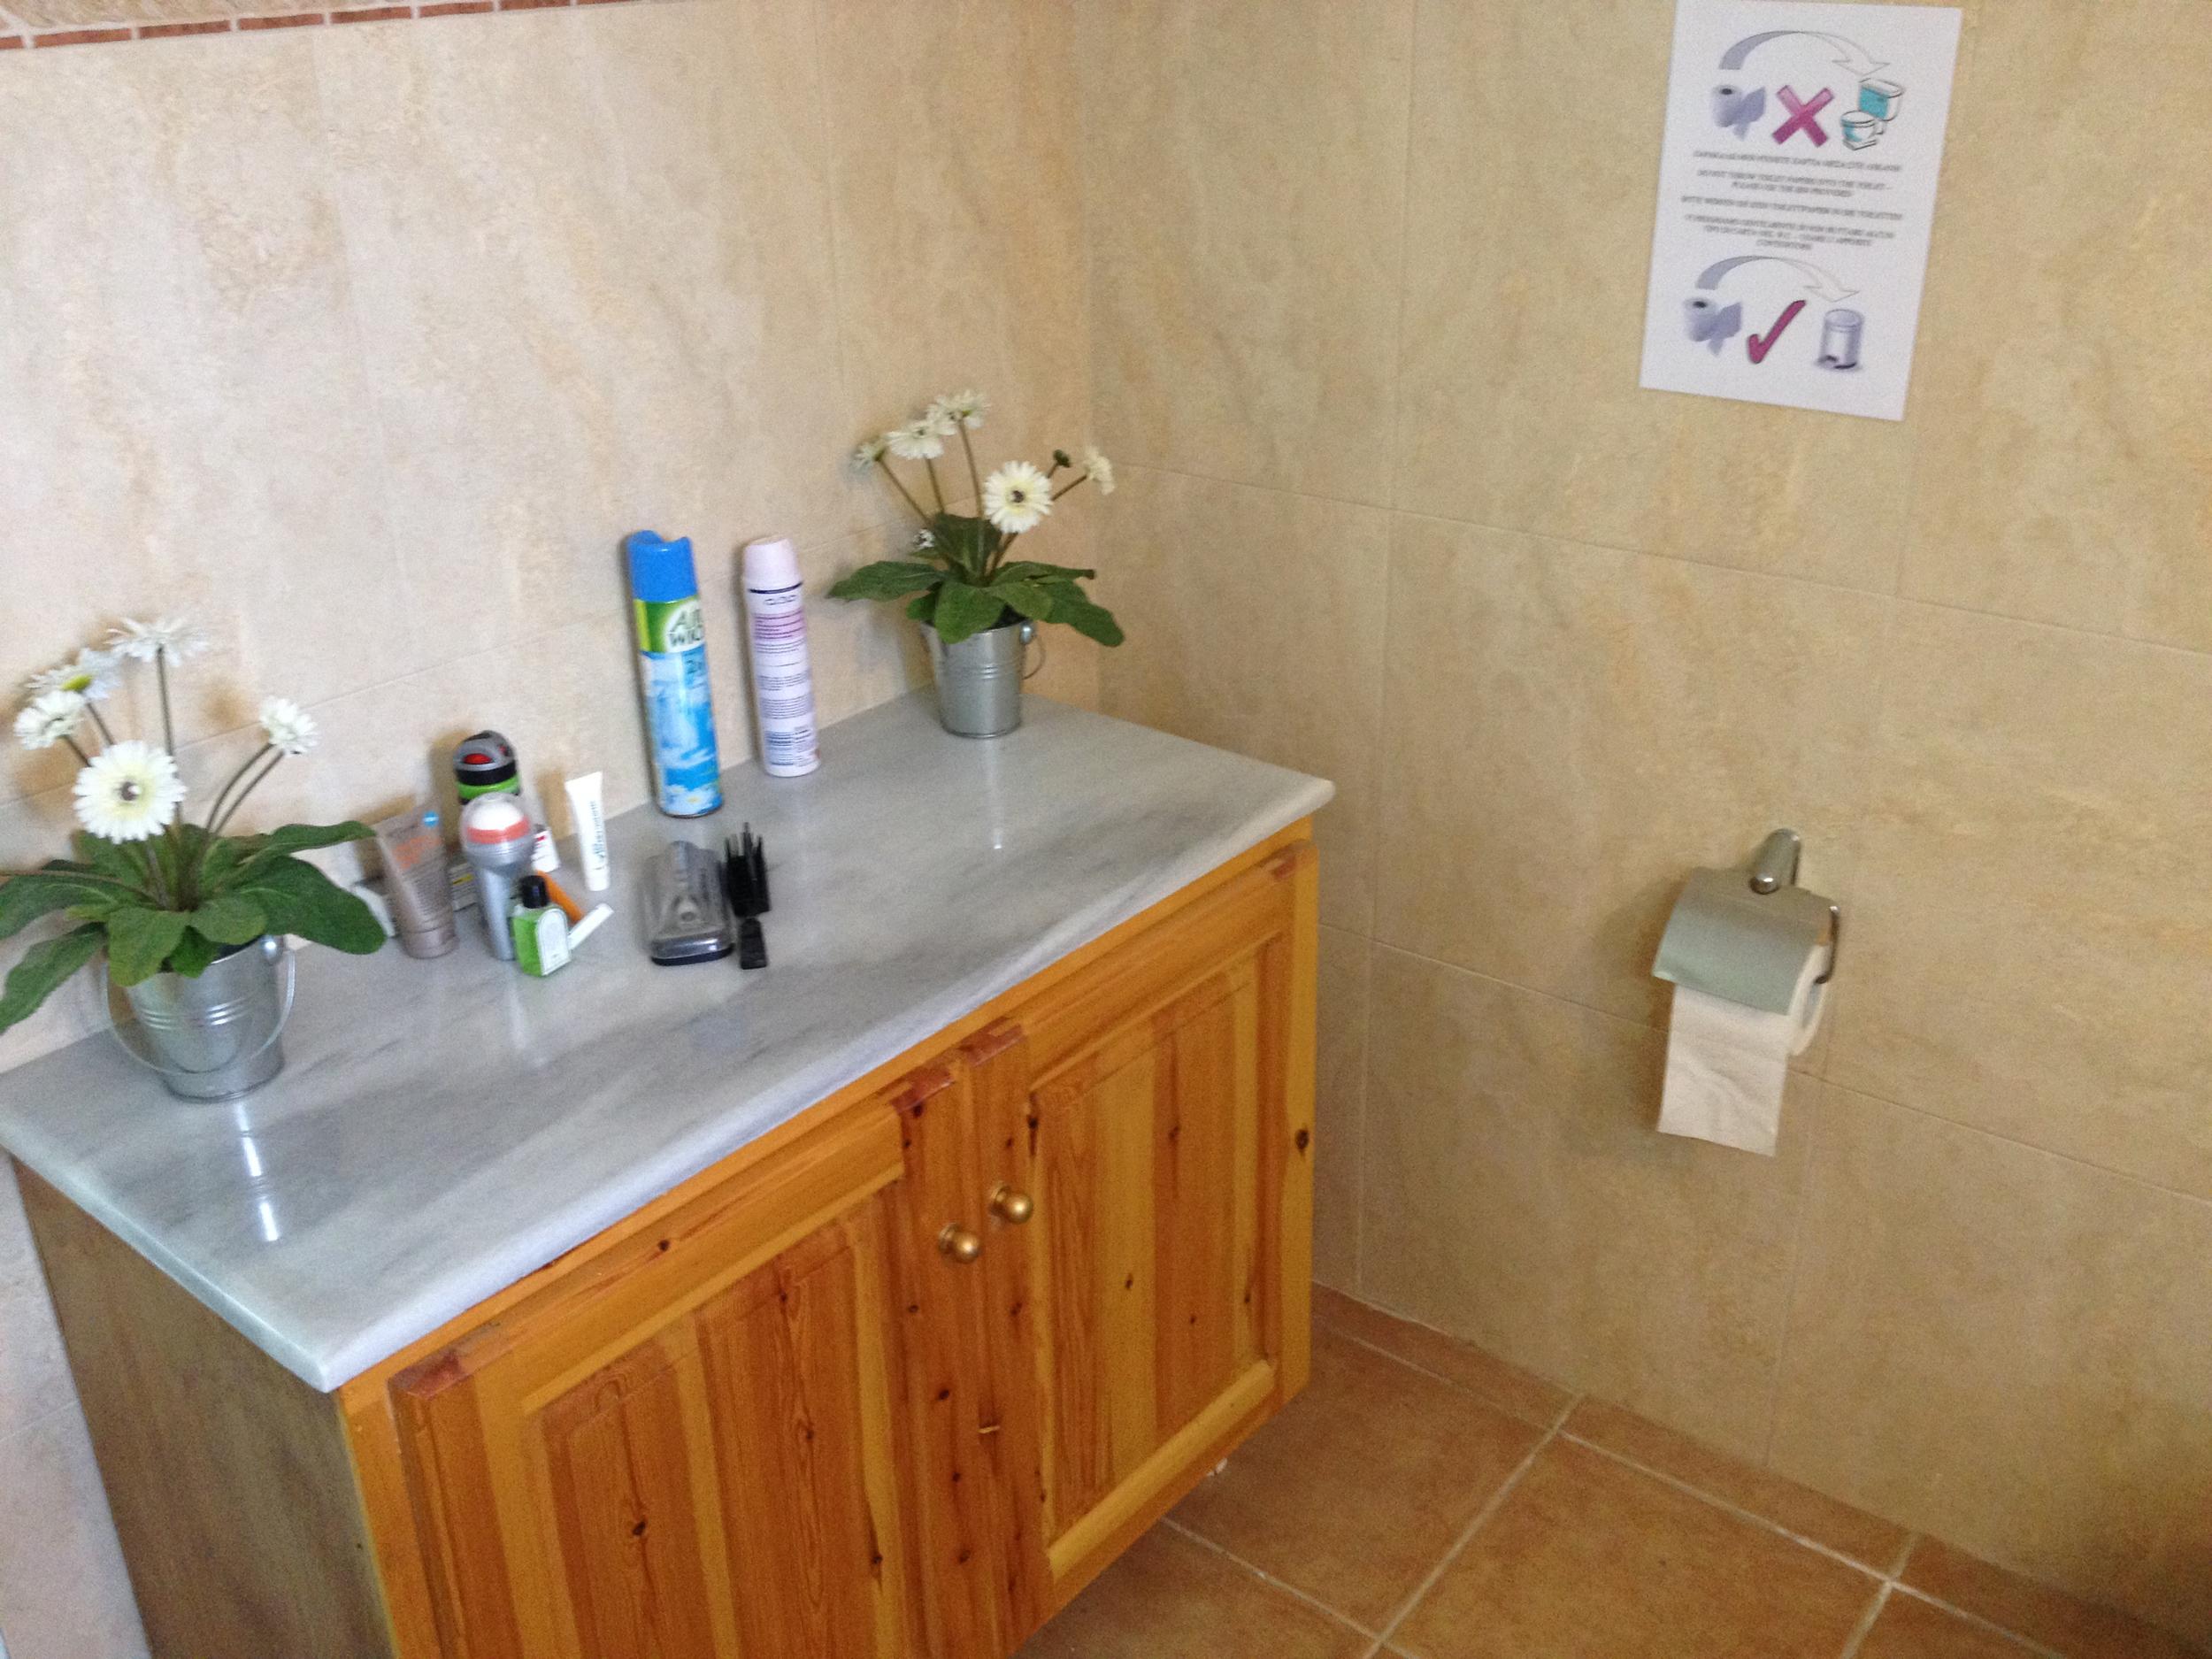 Shower Room Vanity Cabinet.jpg